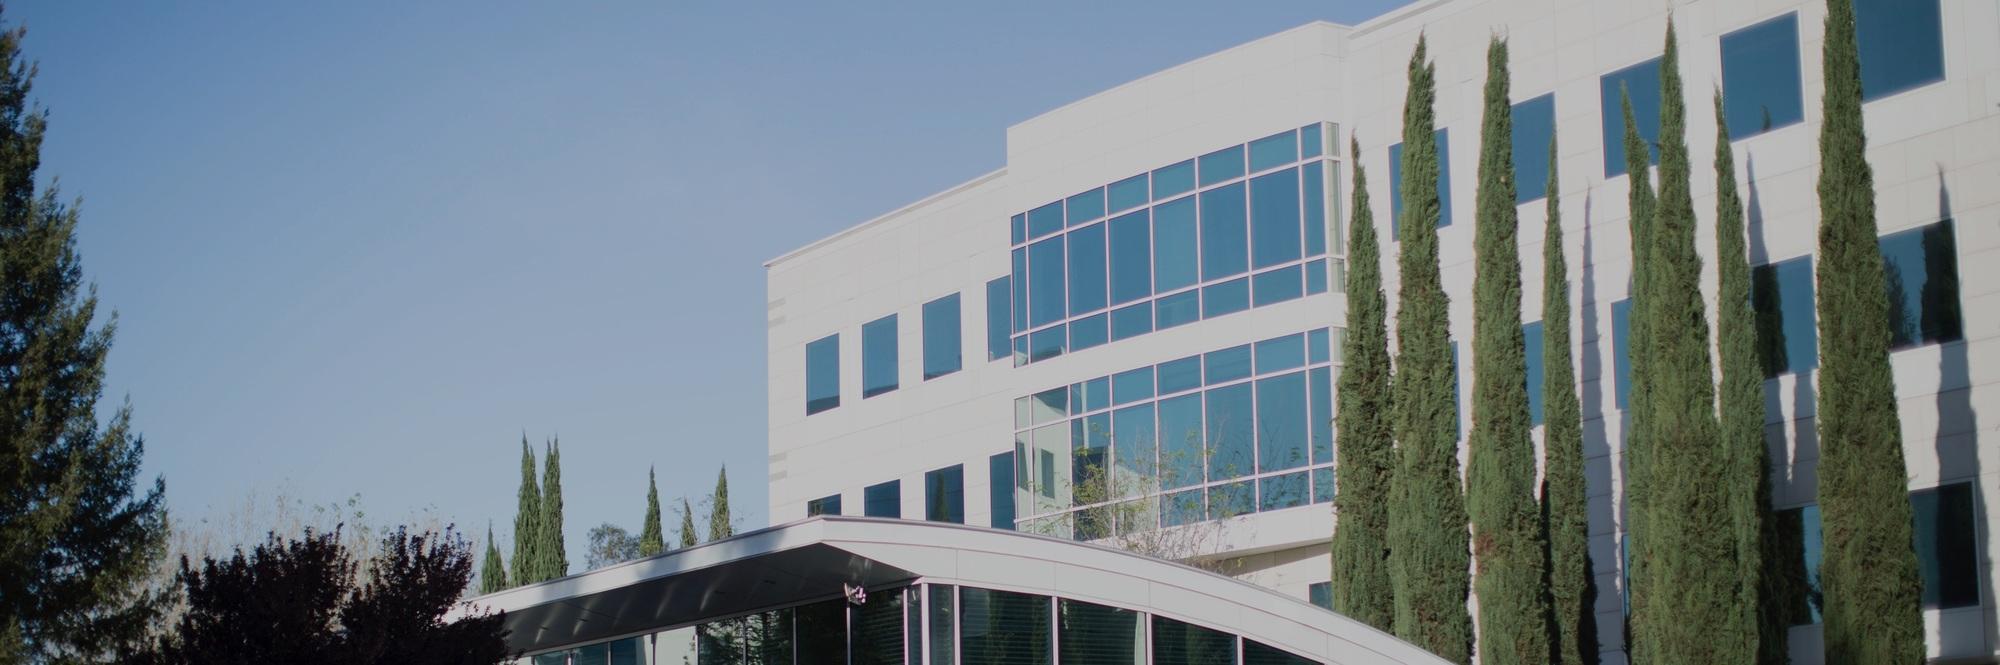 San Jose, CA | PayPal Jobs - PayPal